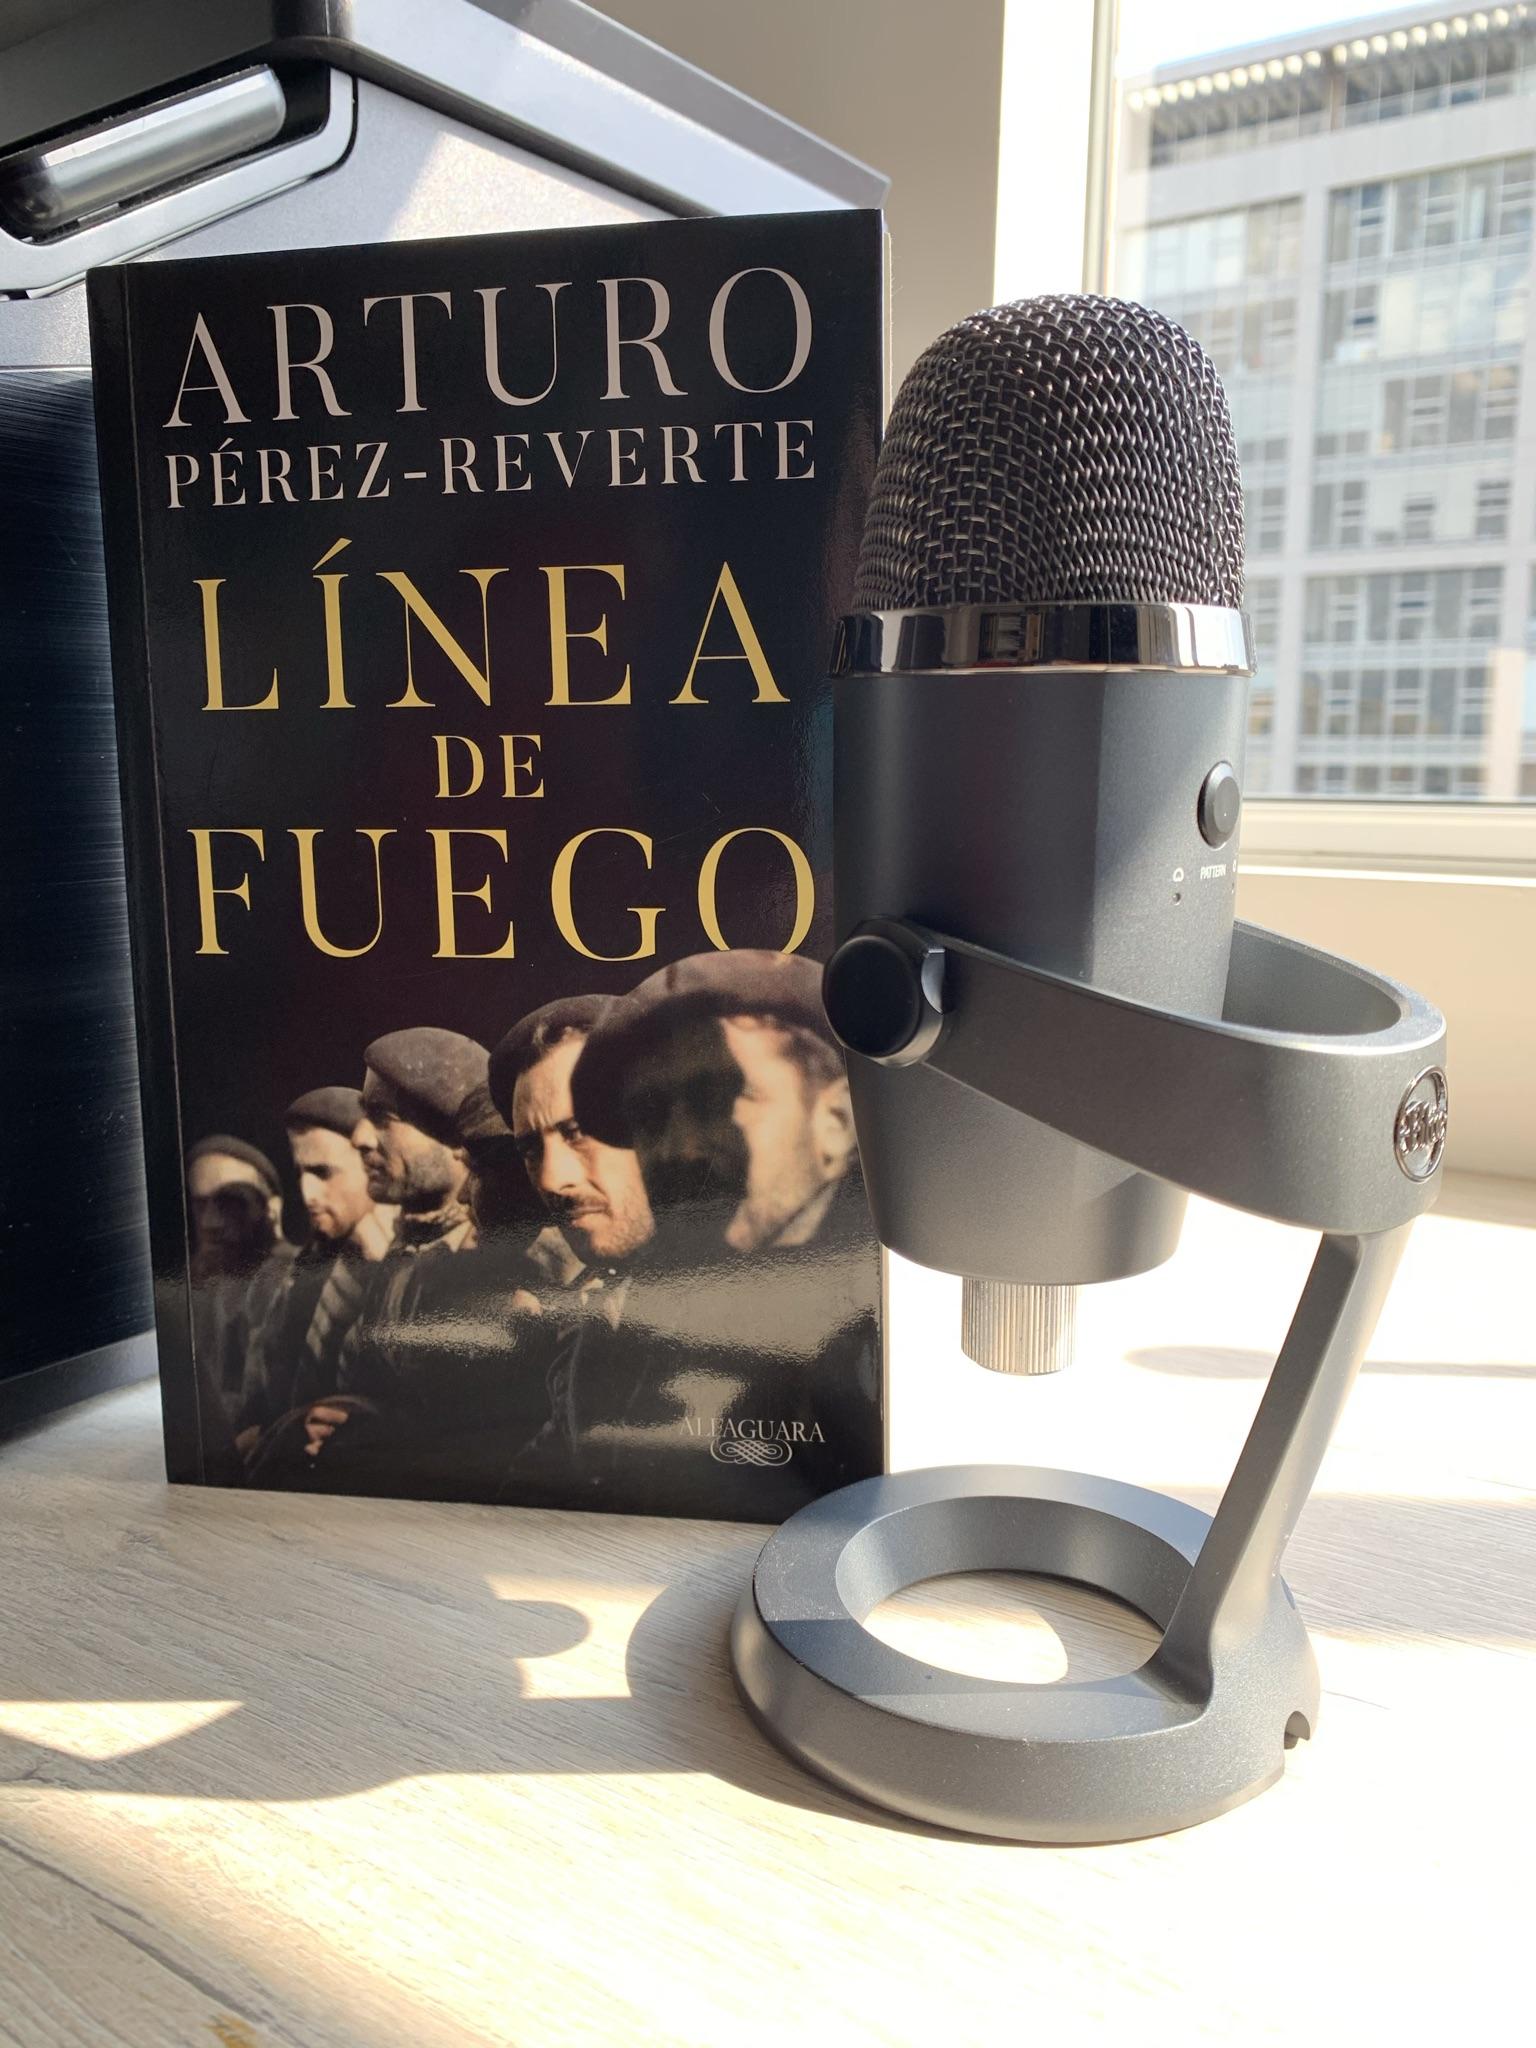 Libro Línea de fuego de Arturo Pérez-Reverte